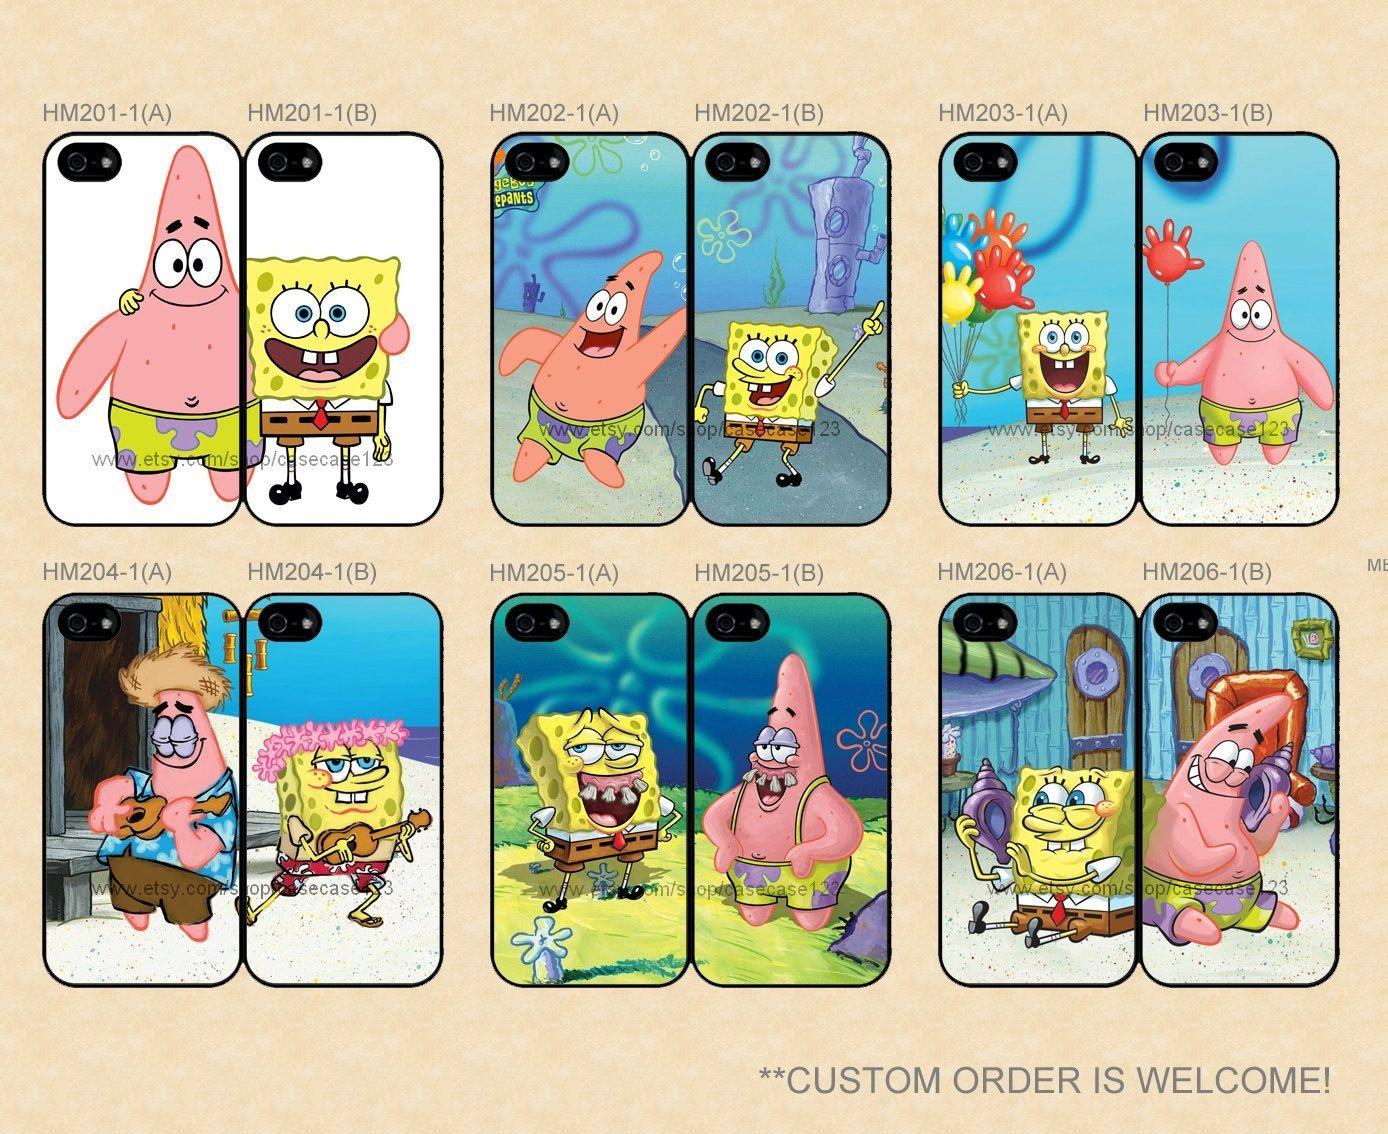 patrick and spongebob best friends forever popular items for best